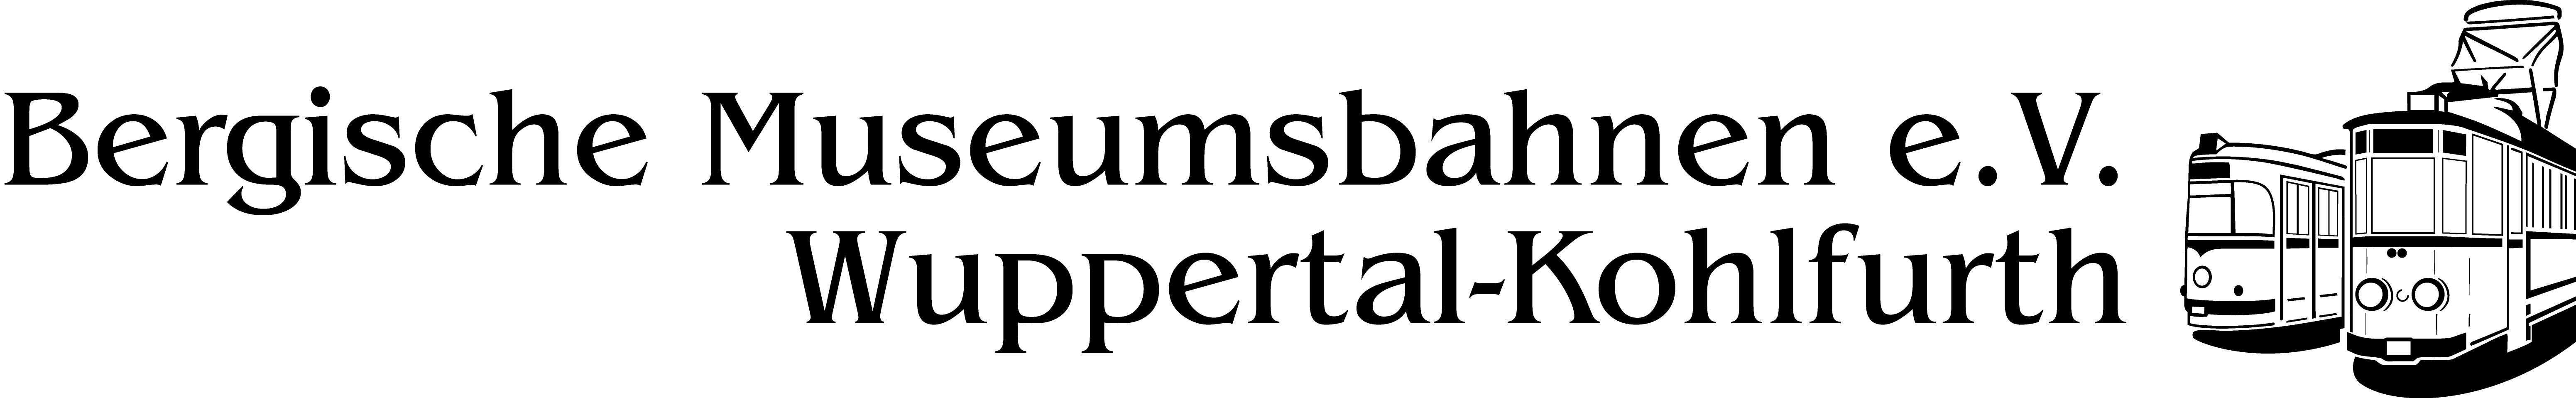 Logo Bergische Museumsbahnen e.V.